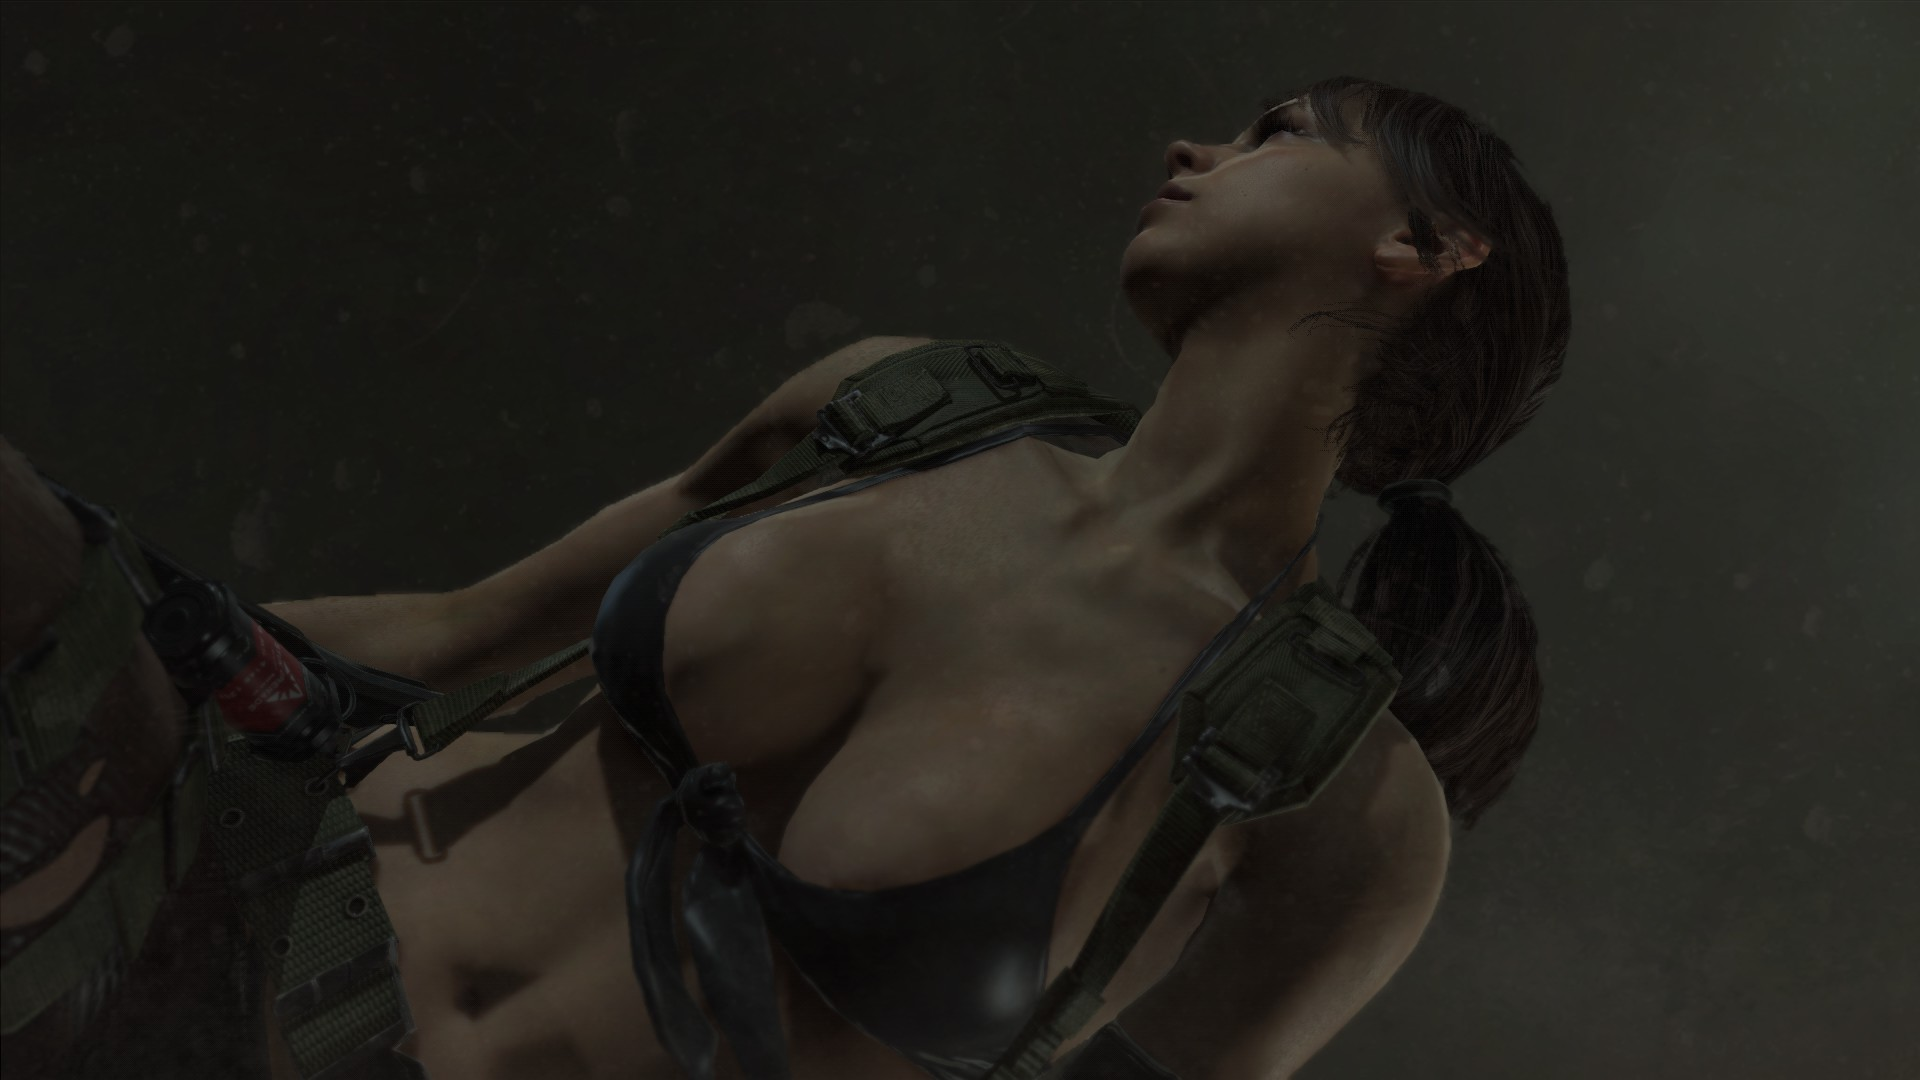 загруженное (8).jpg - Metal Gear Solid 5: The Phantom Pain